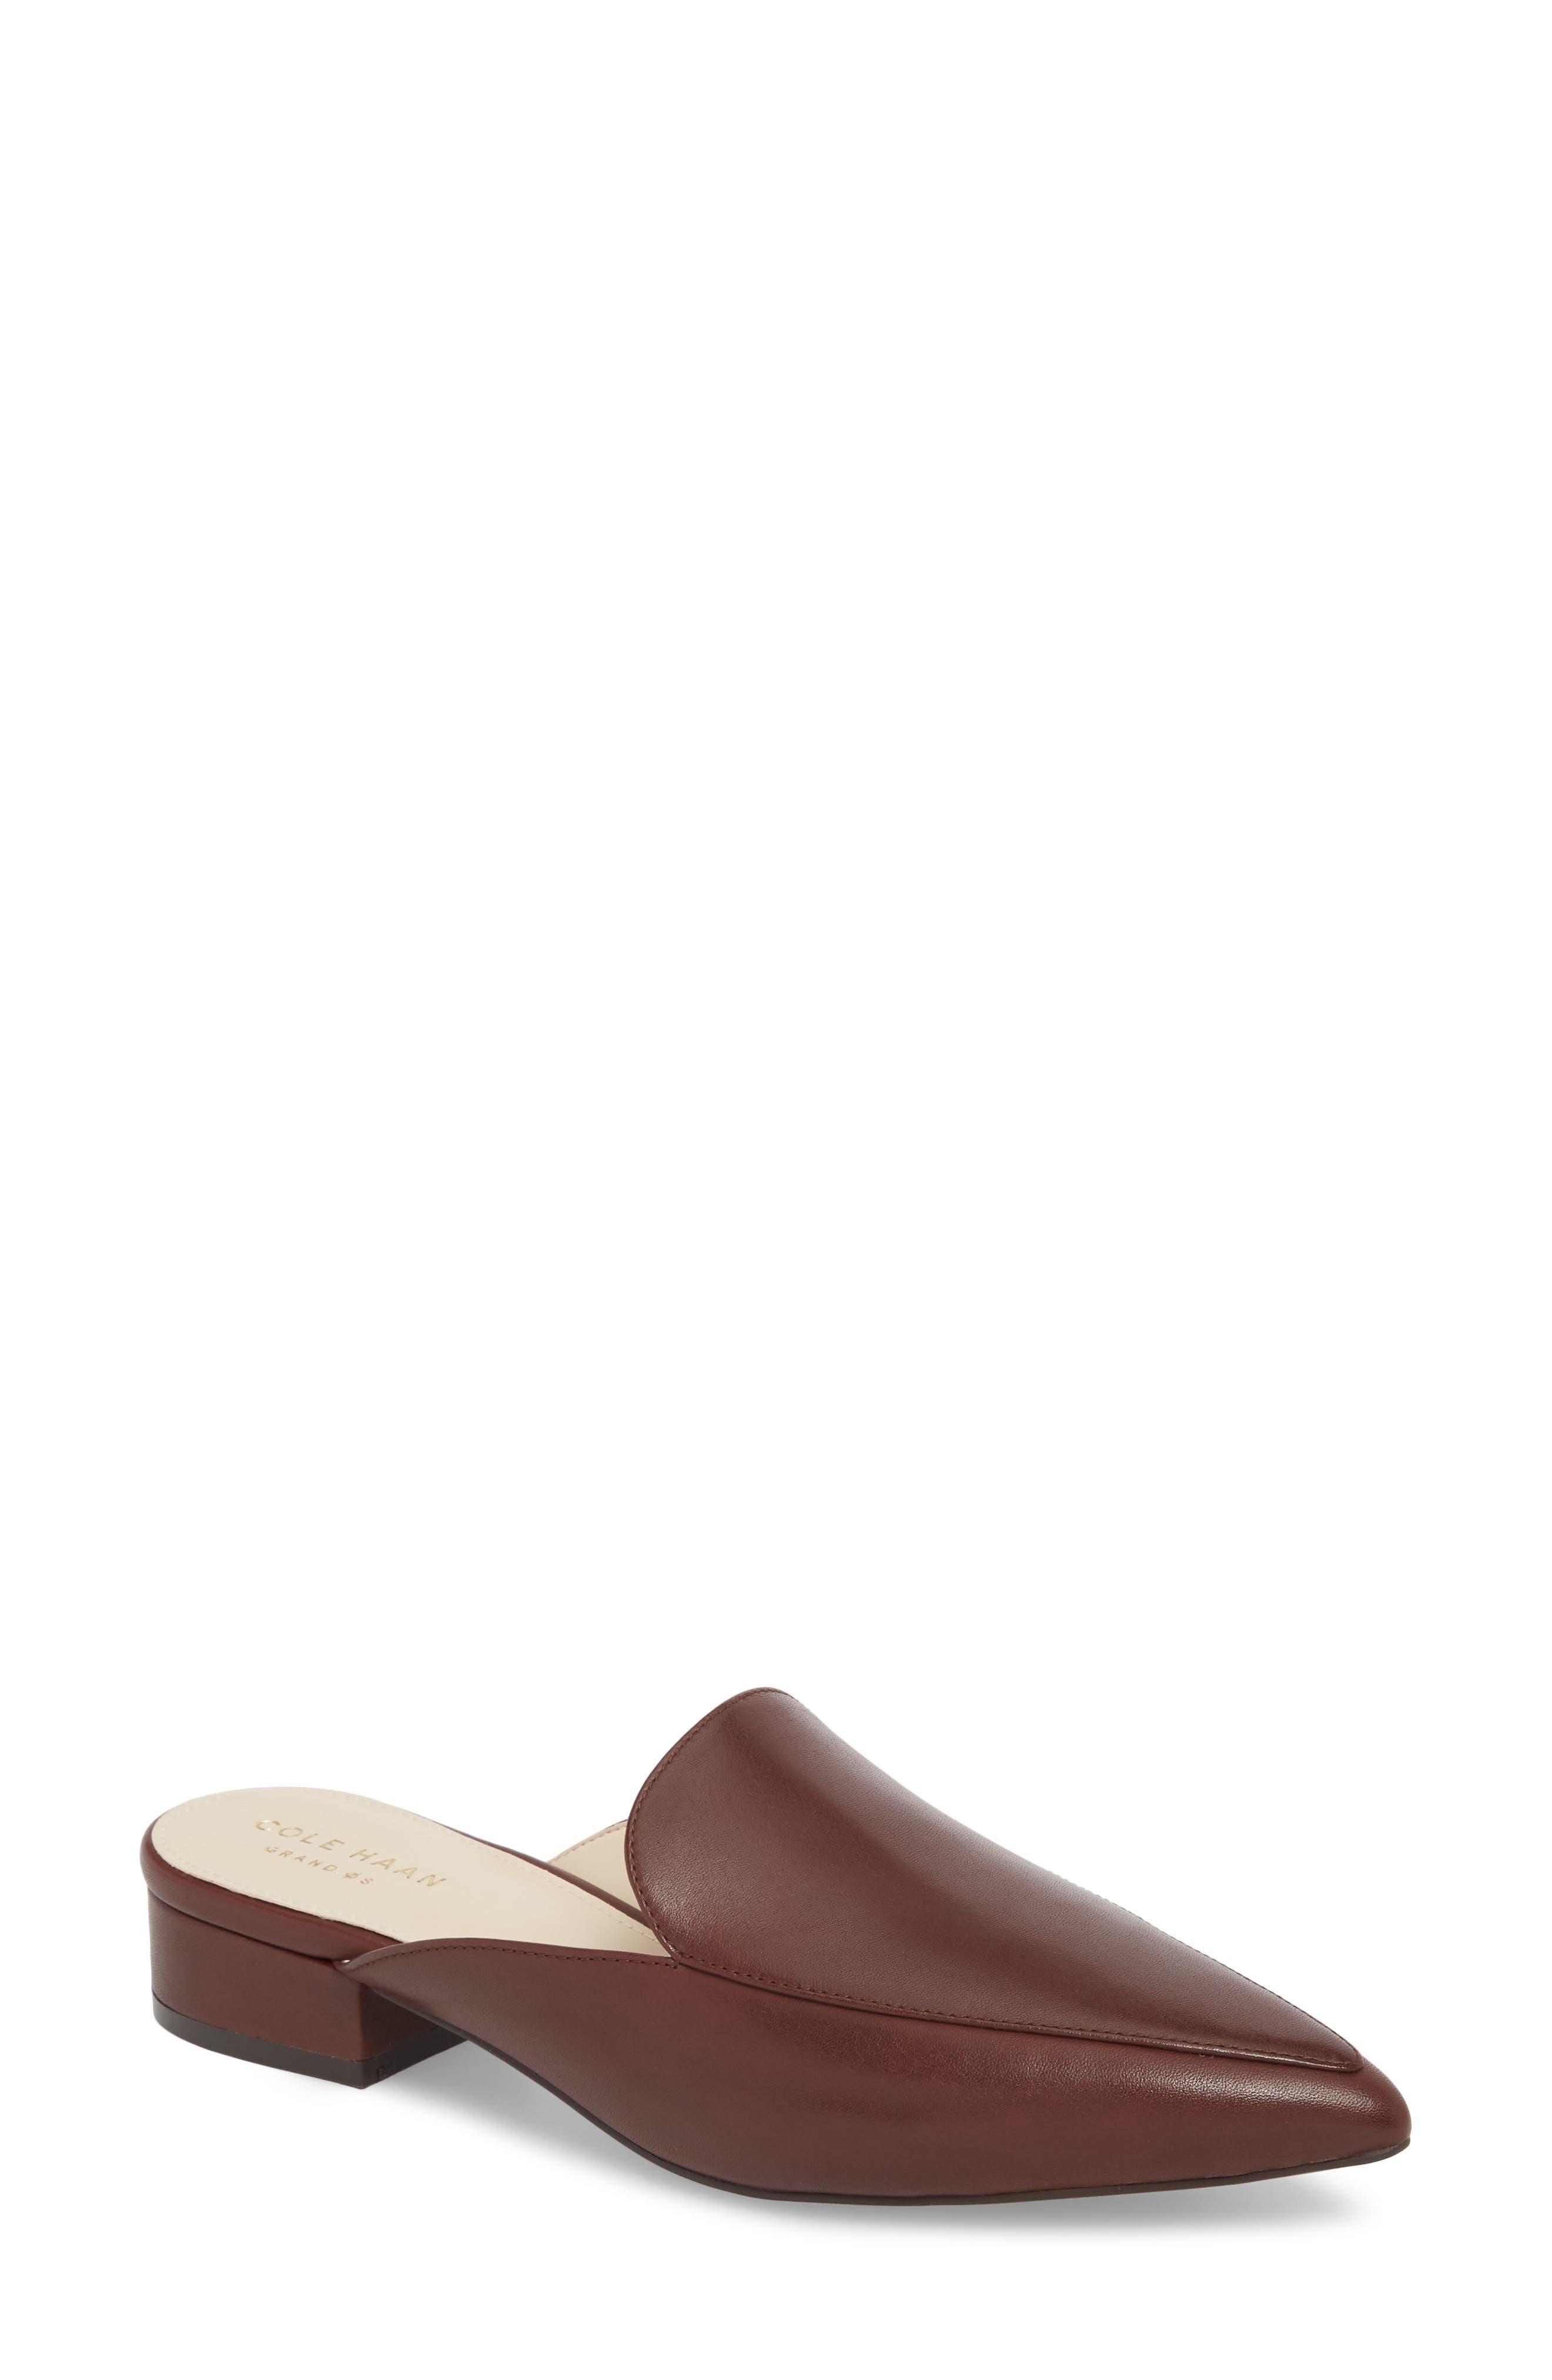 e68eaa4e423b83 Women s Pointed Toe Mules   Slides